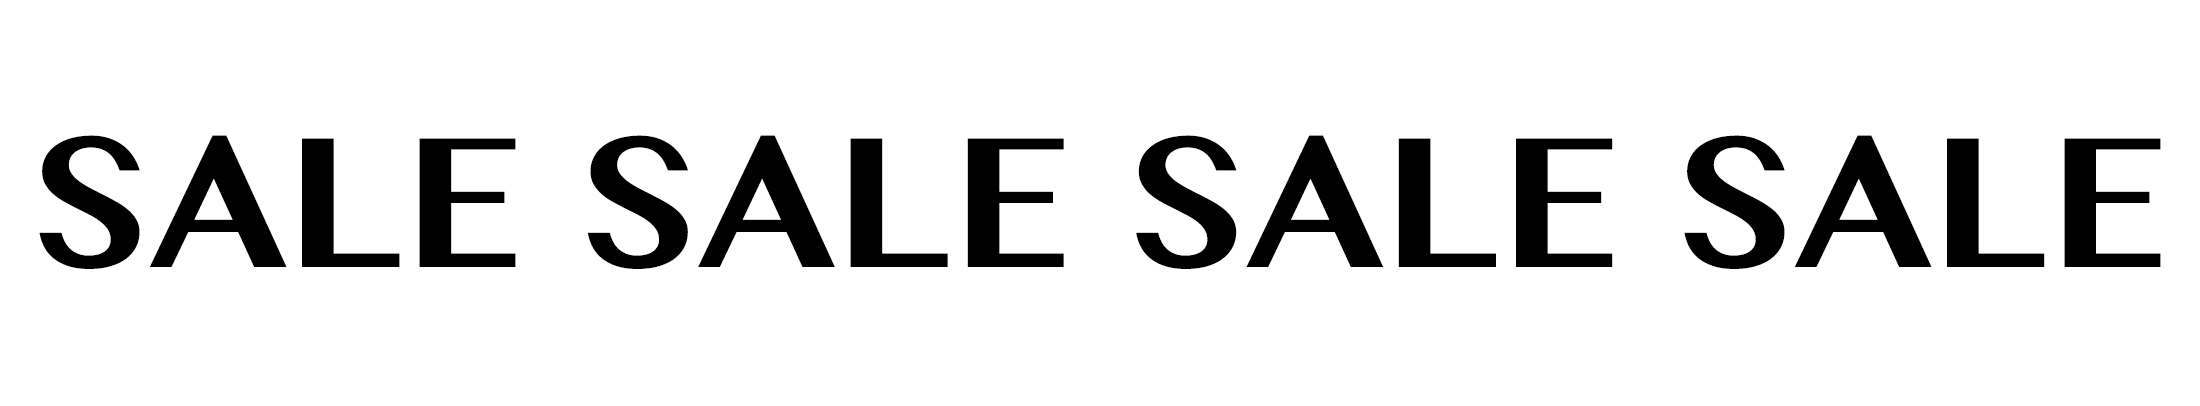 salee